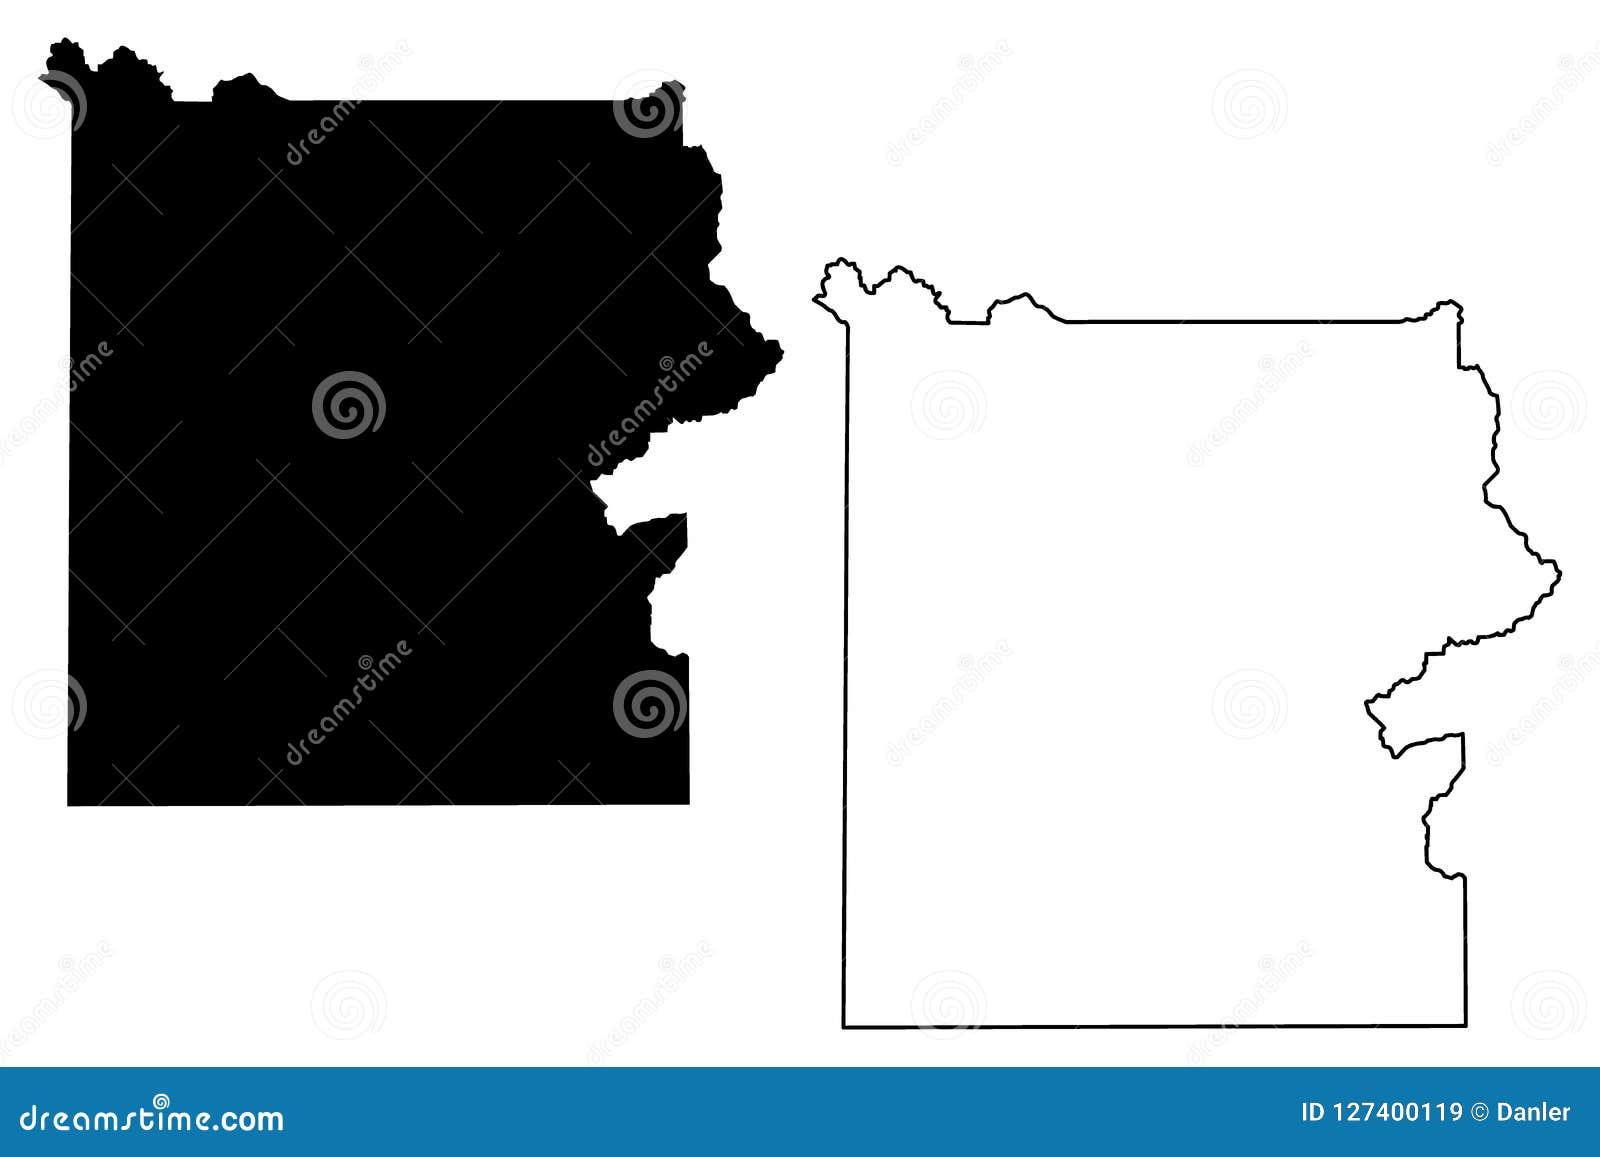 Yellowstone National Park Map Vector Stock Vector